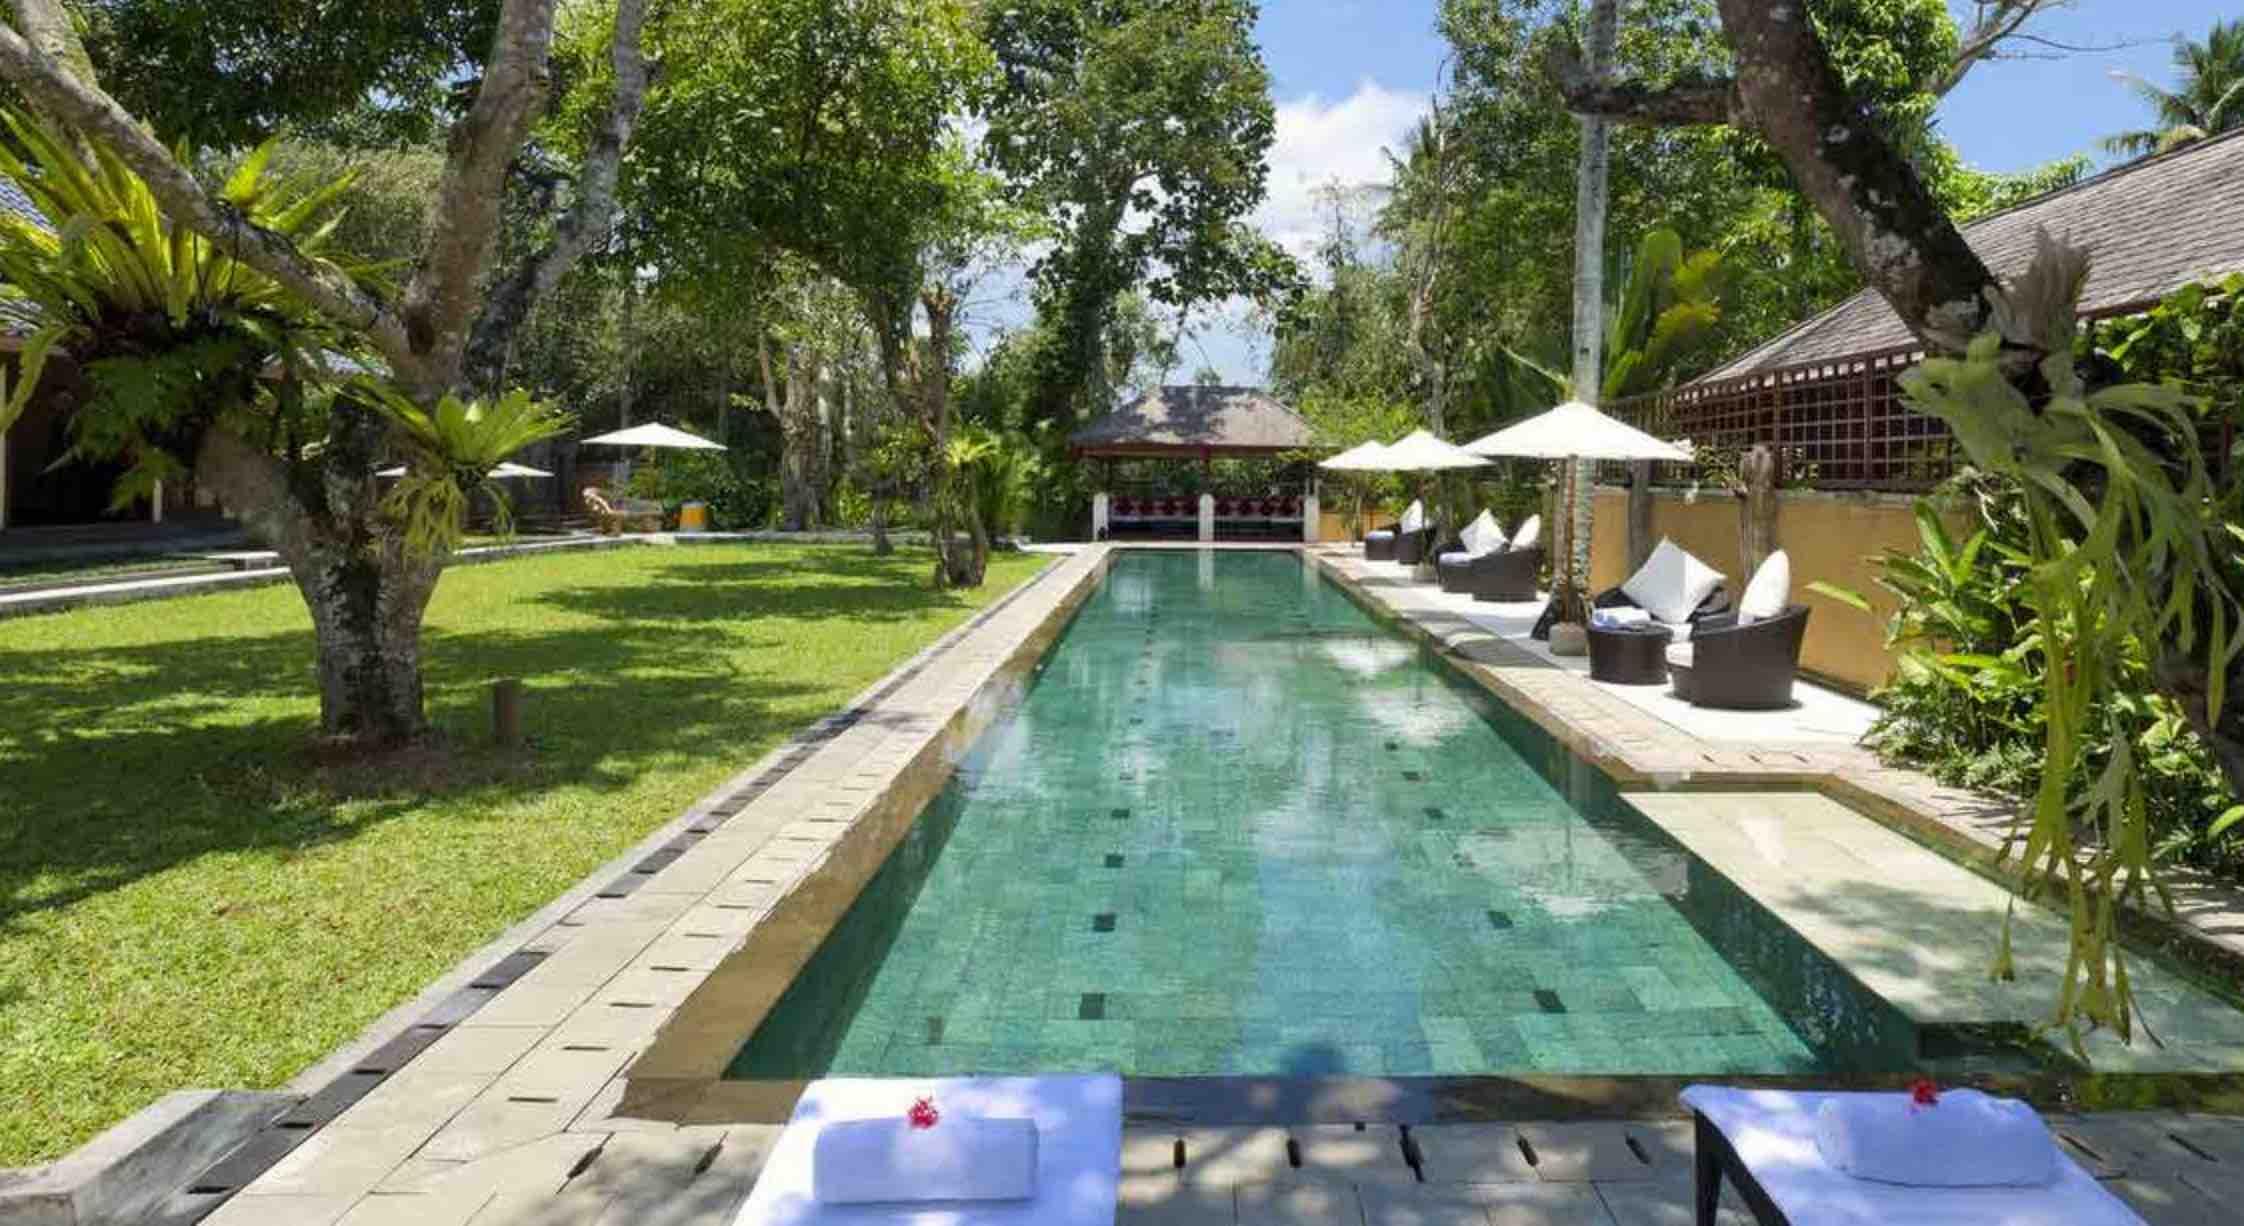 villa san in ubud - where to stay in bali